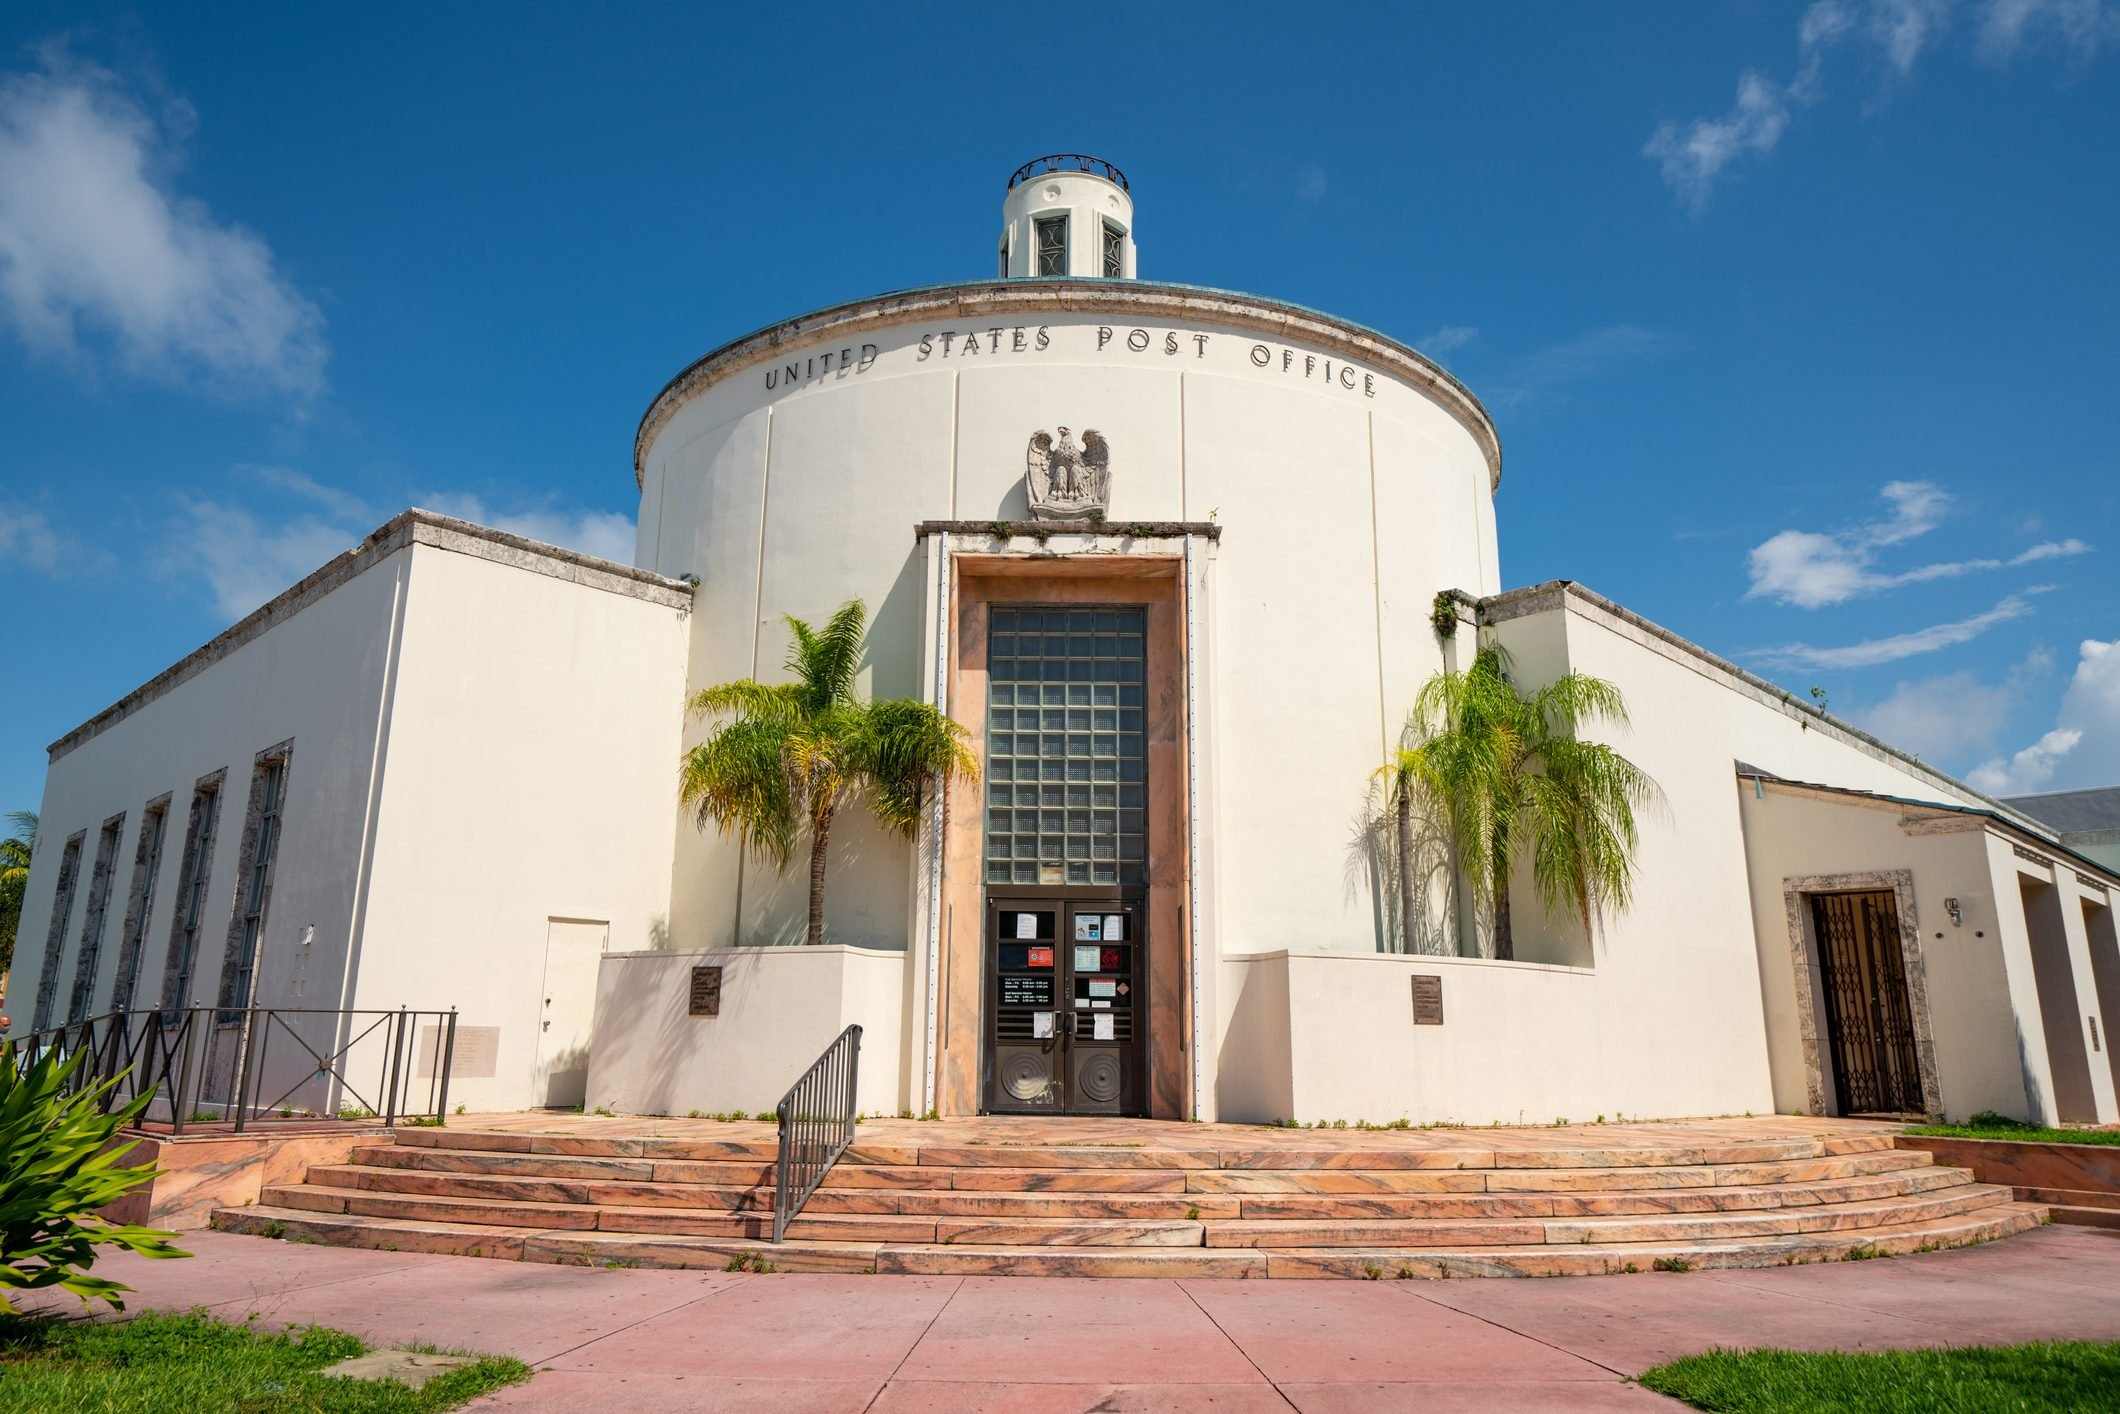 Photo USPS United States Post Office Miami Beach historic location